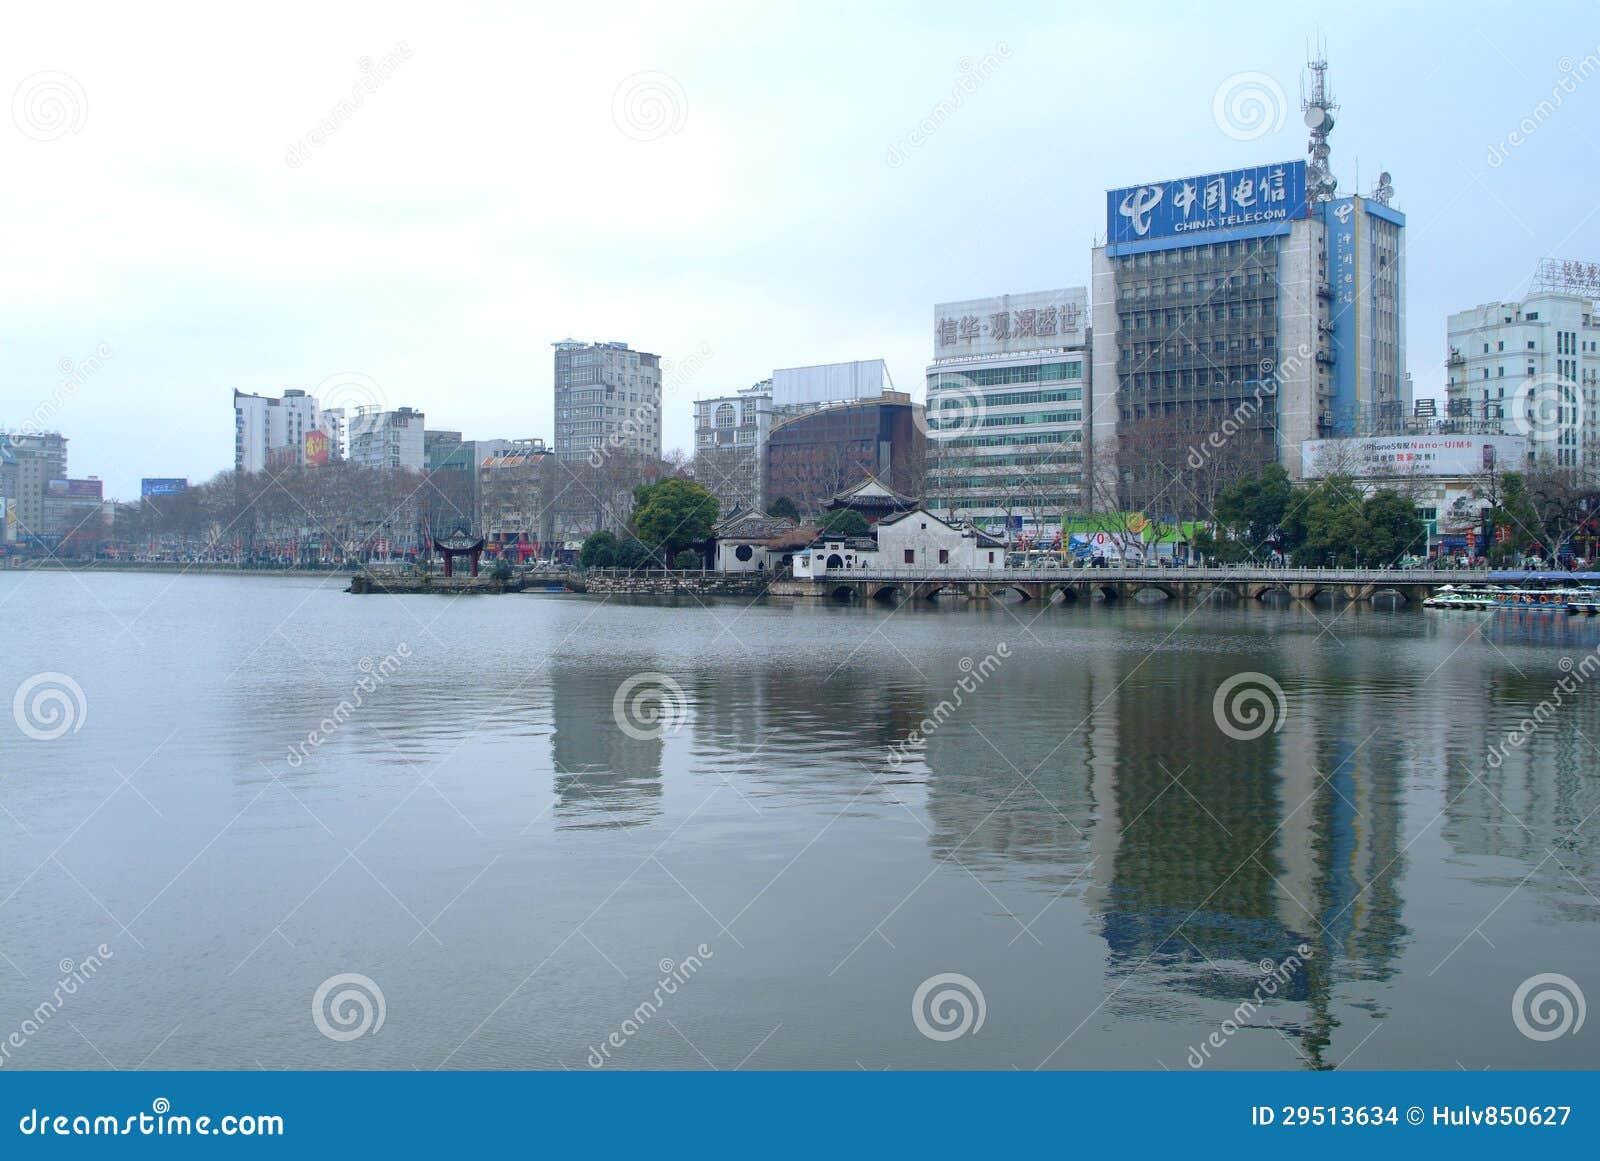 Beroemde Chinese architectuur